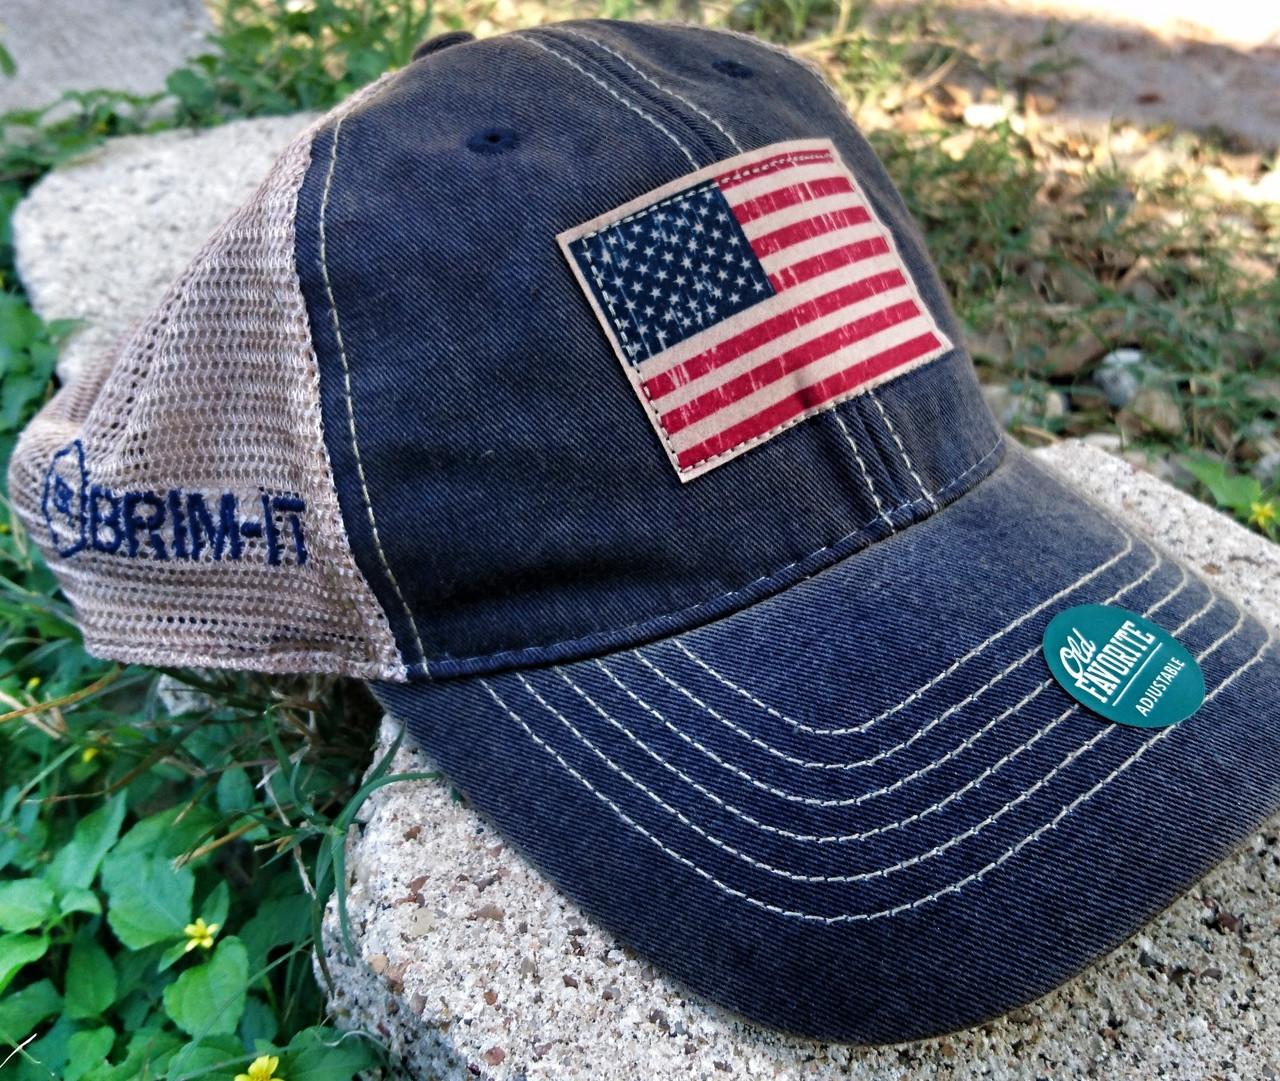 American Flag trucker mesh back - Brim-it 35c5e9e934c7